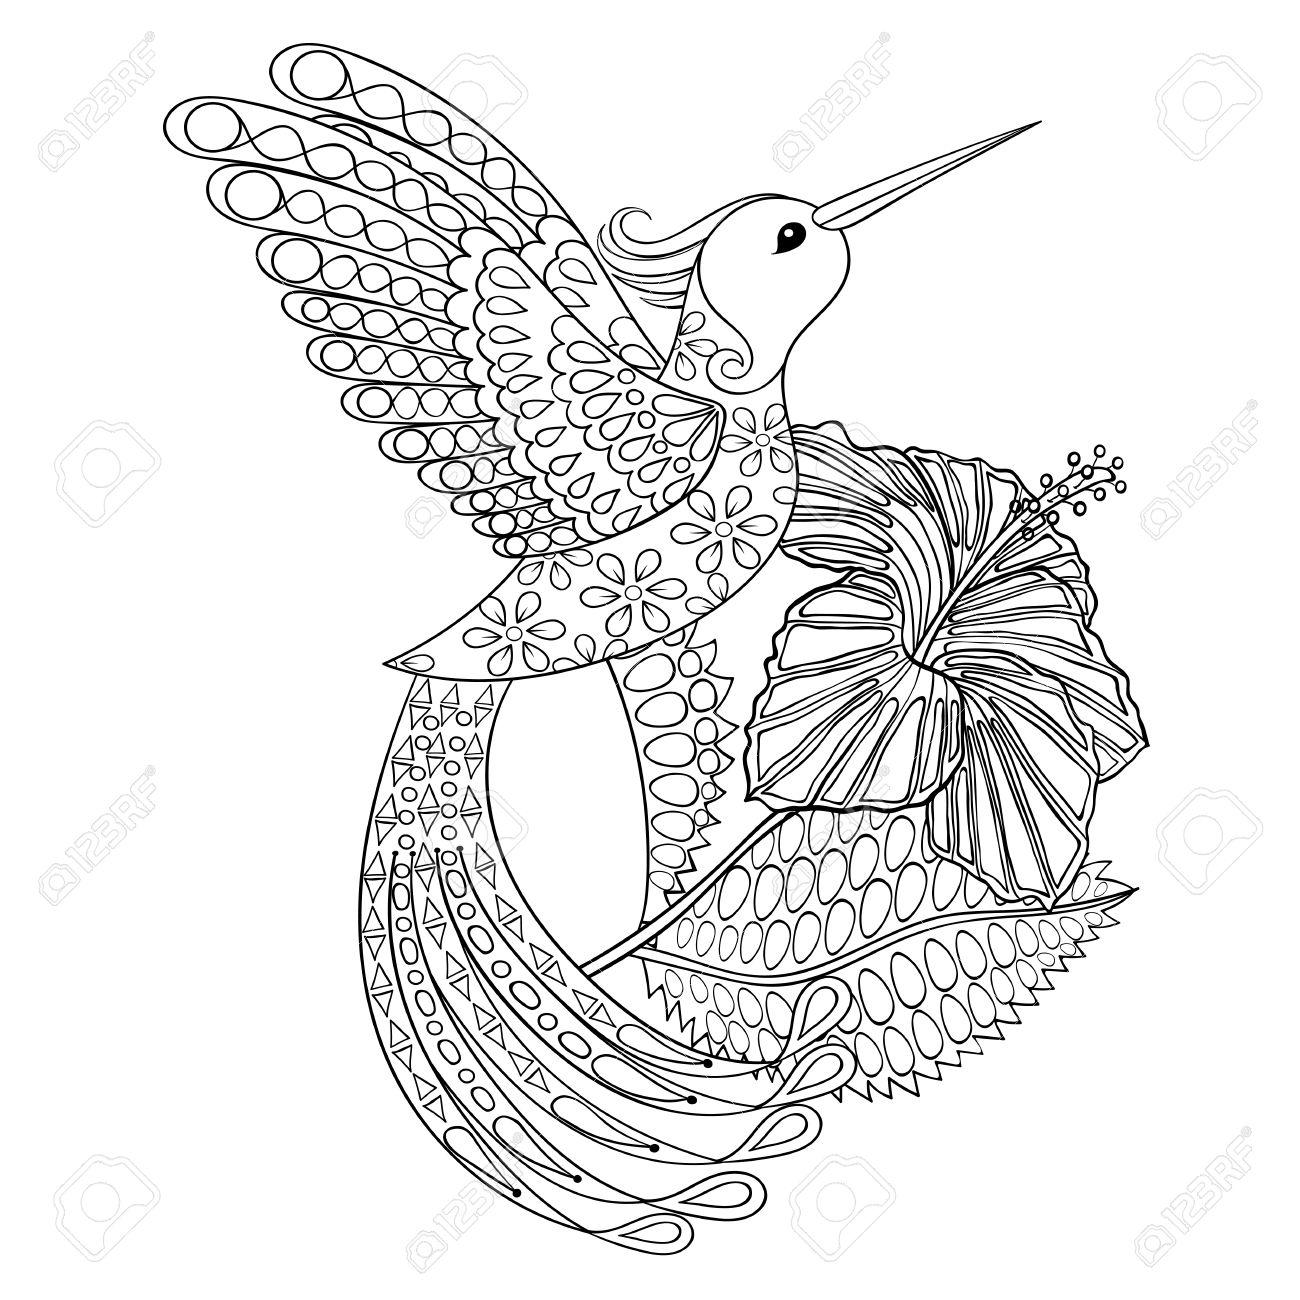 Malvorlage Mit Hummingbird In Hibiskus Zentangle Illustartion Fur